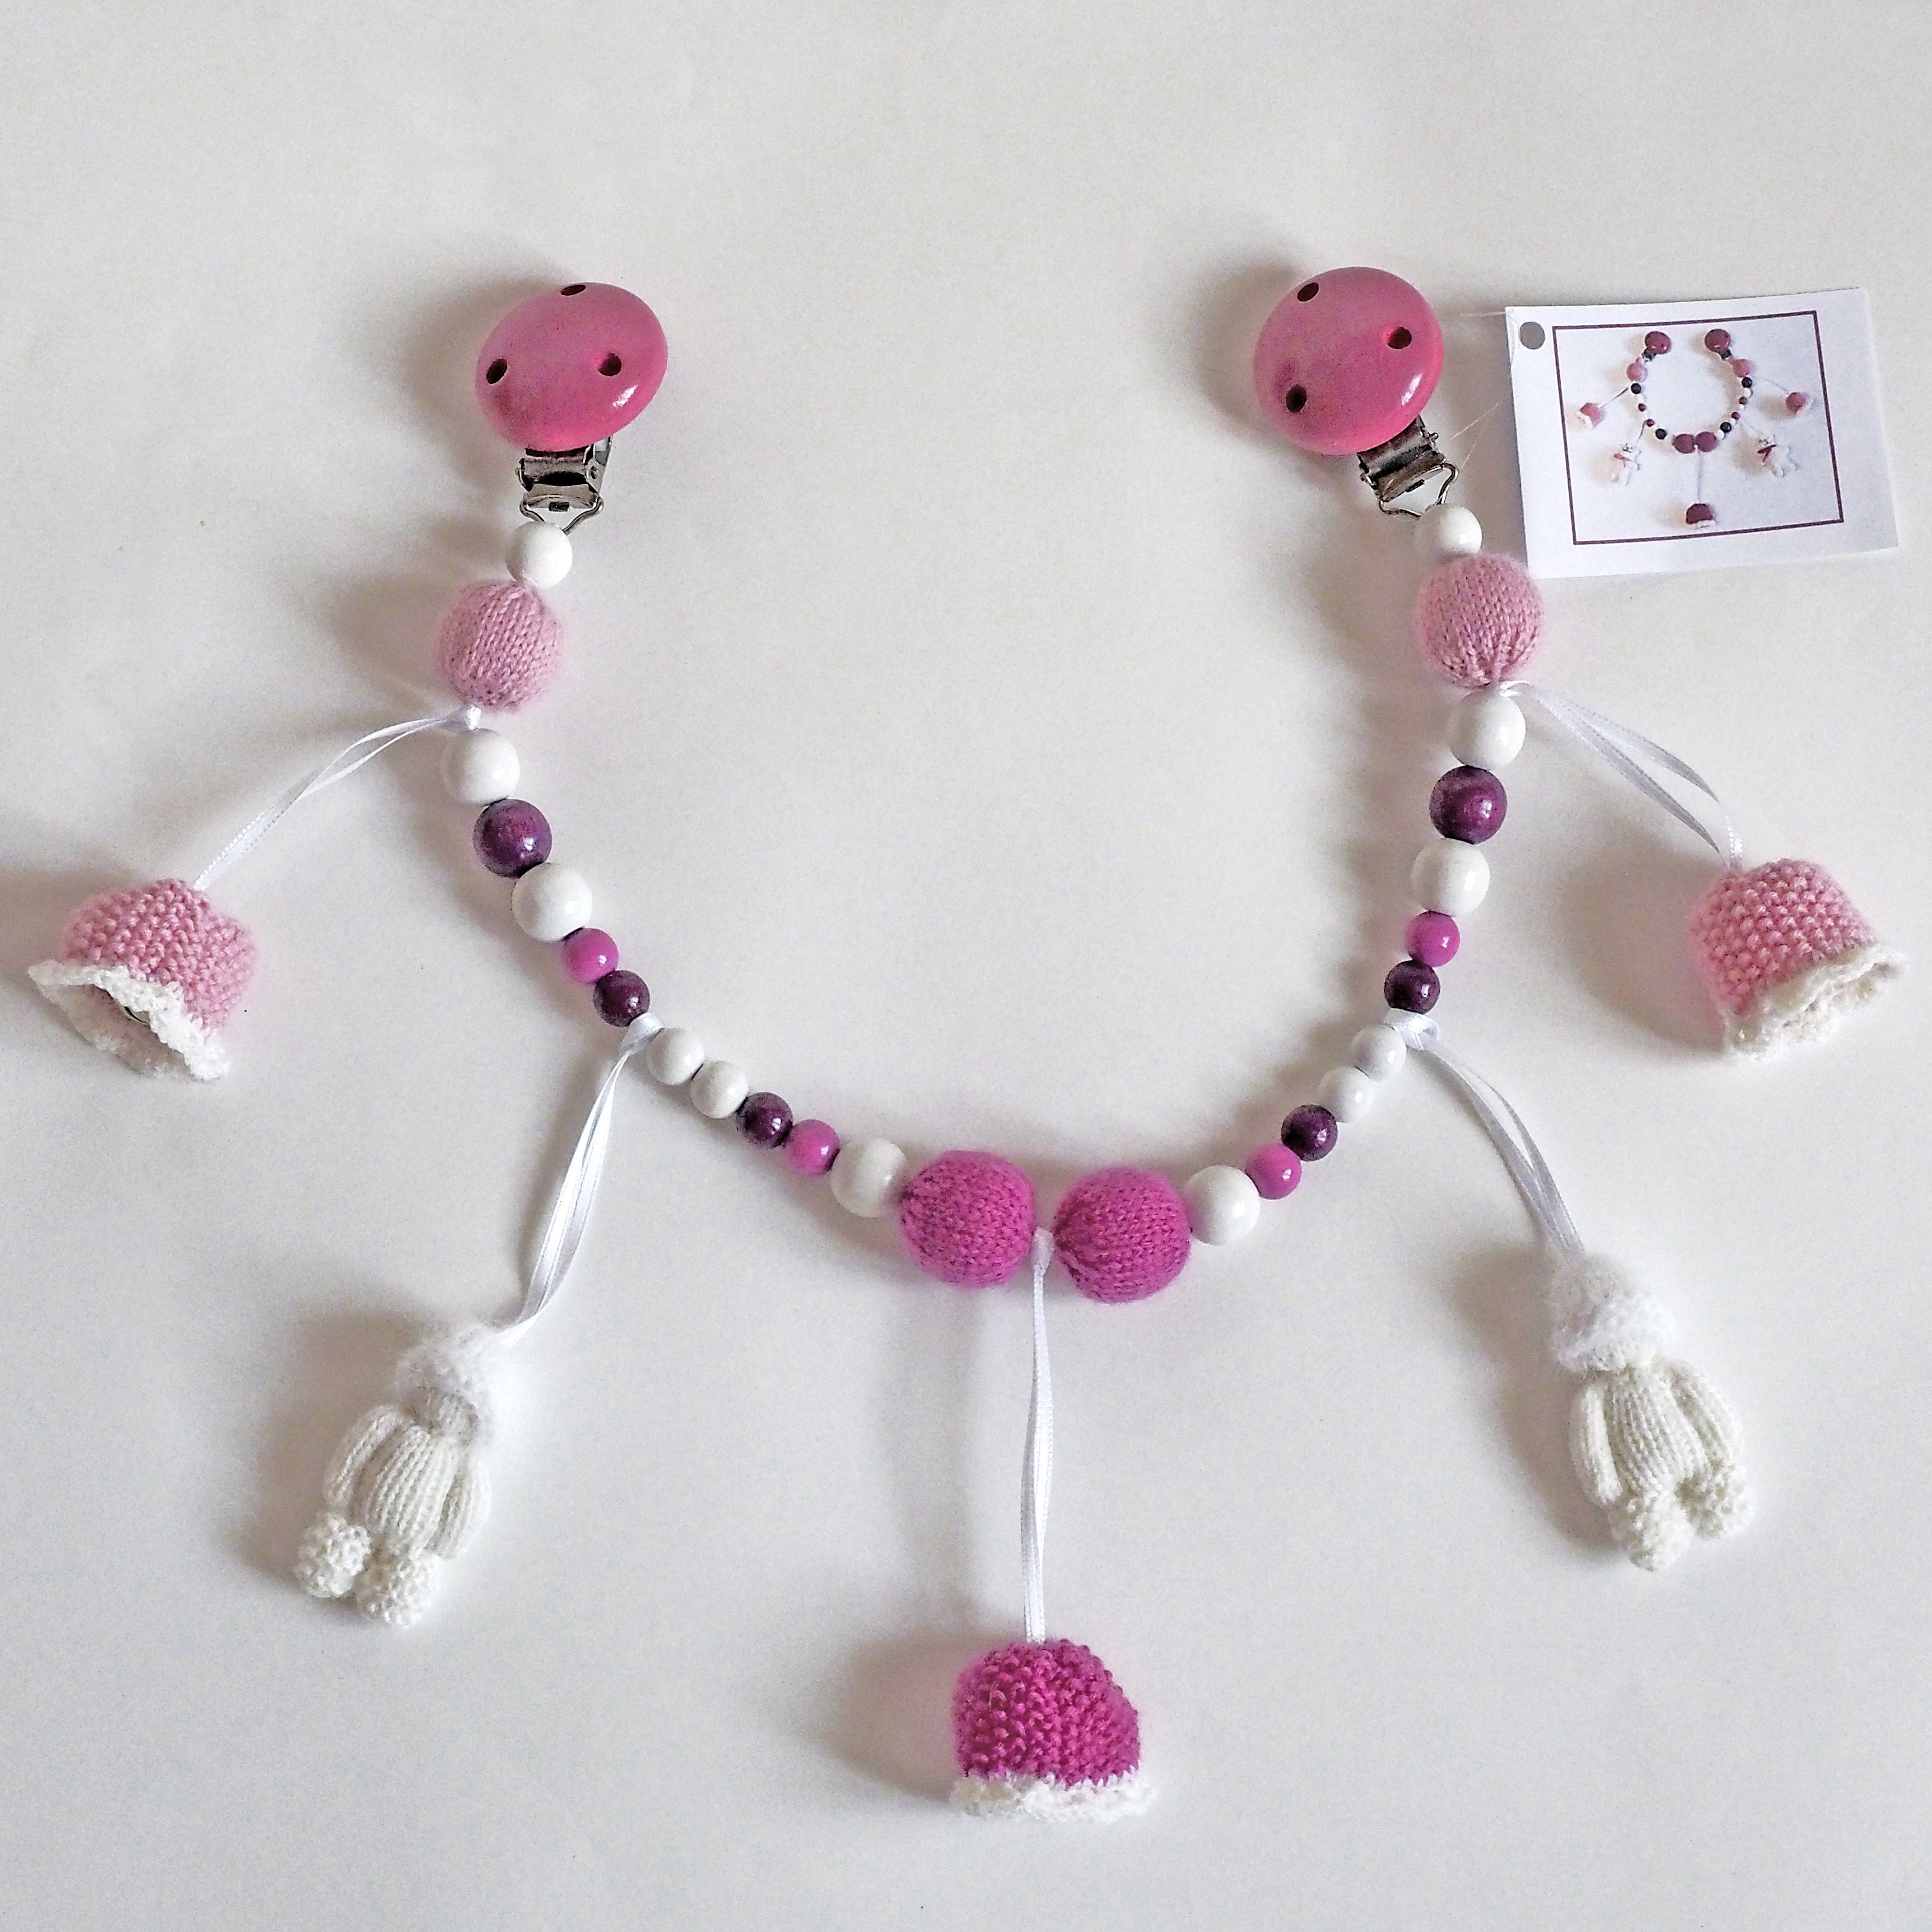 LIS_Kinderwagenkette_pink_3455_498px